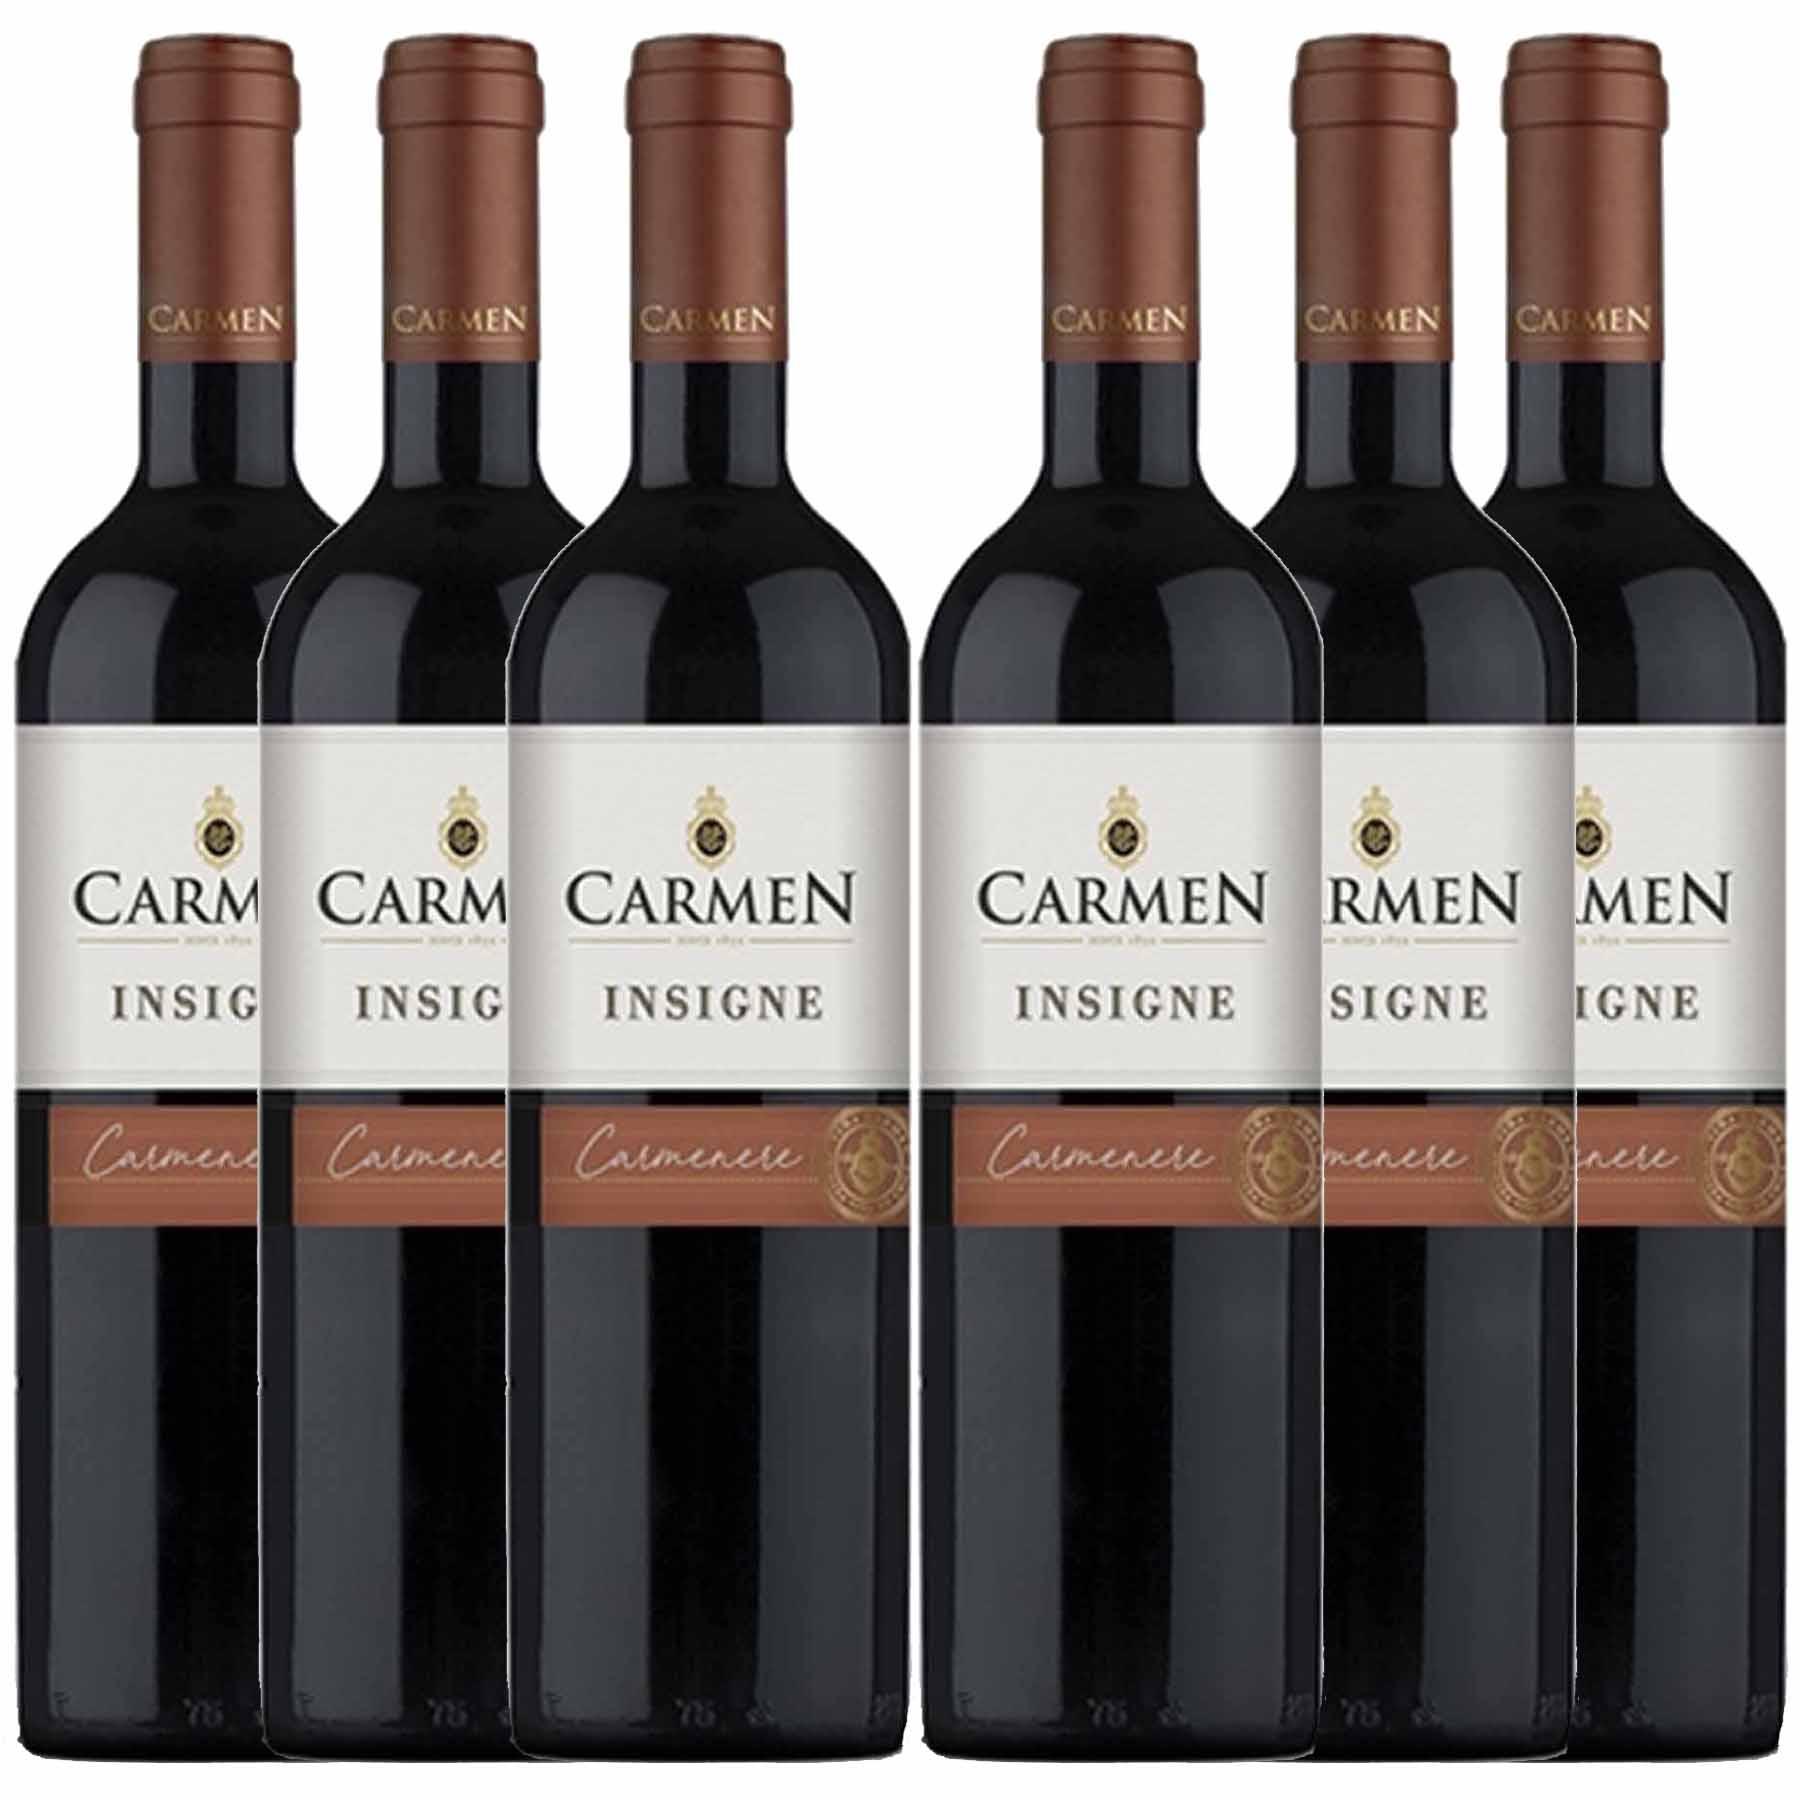 Kit 6x Vinho Tinto Chileno Carmen Insigne Carmenere 2018